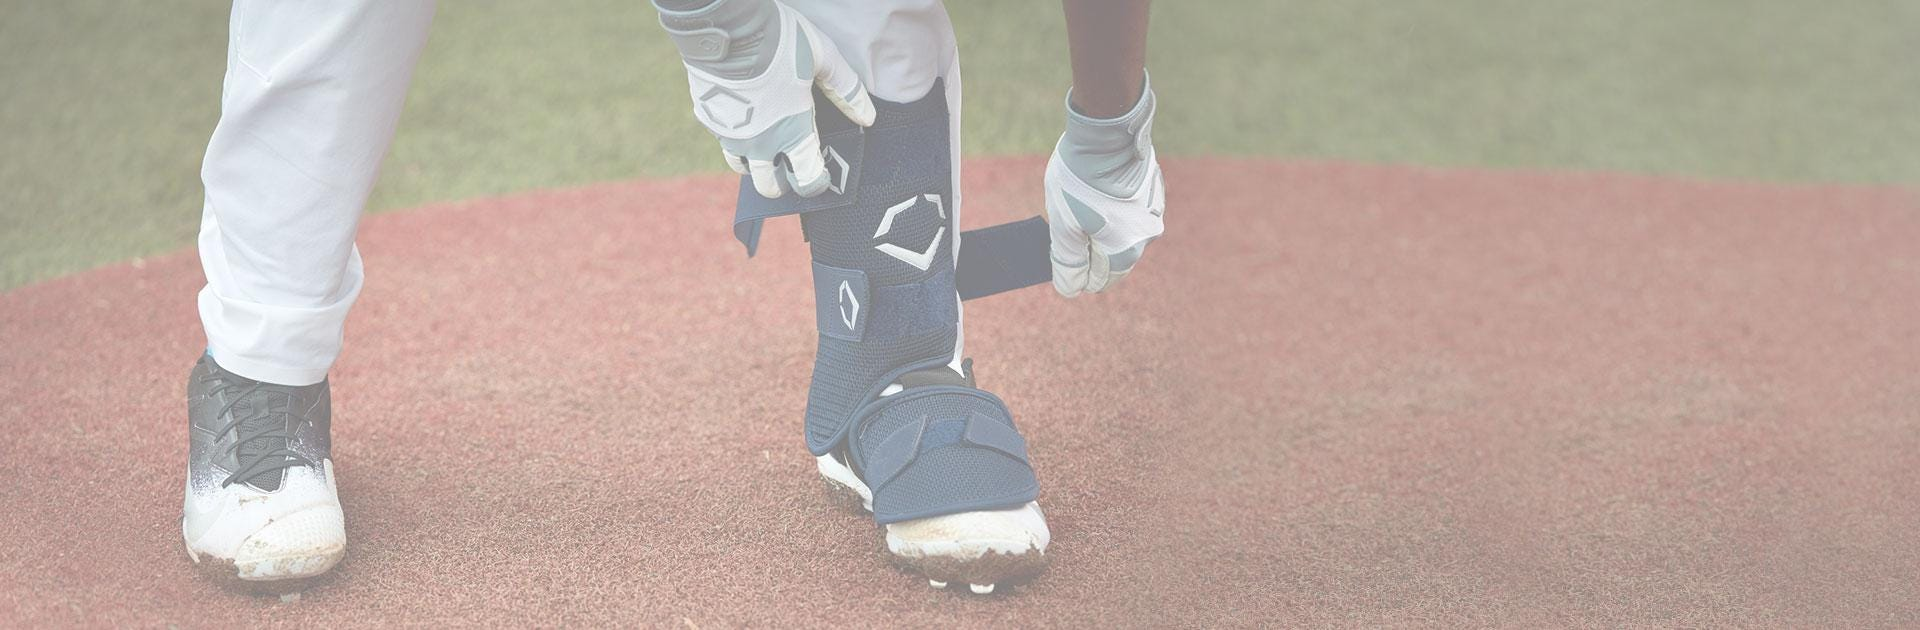 PRO-SRZ Extended Leg Guard